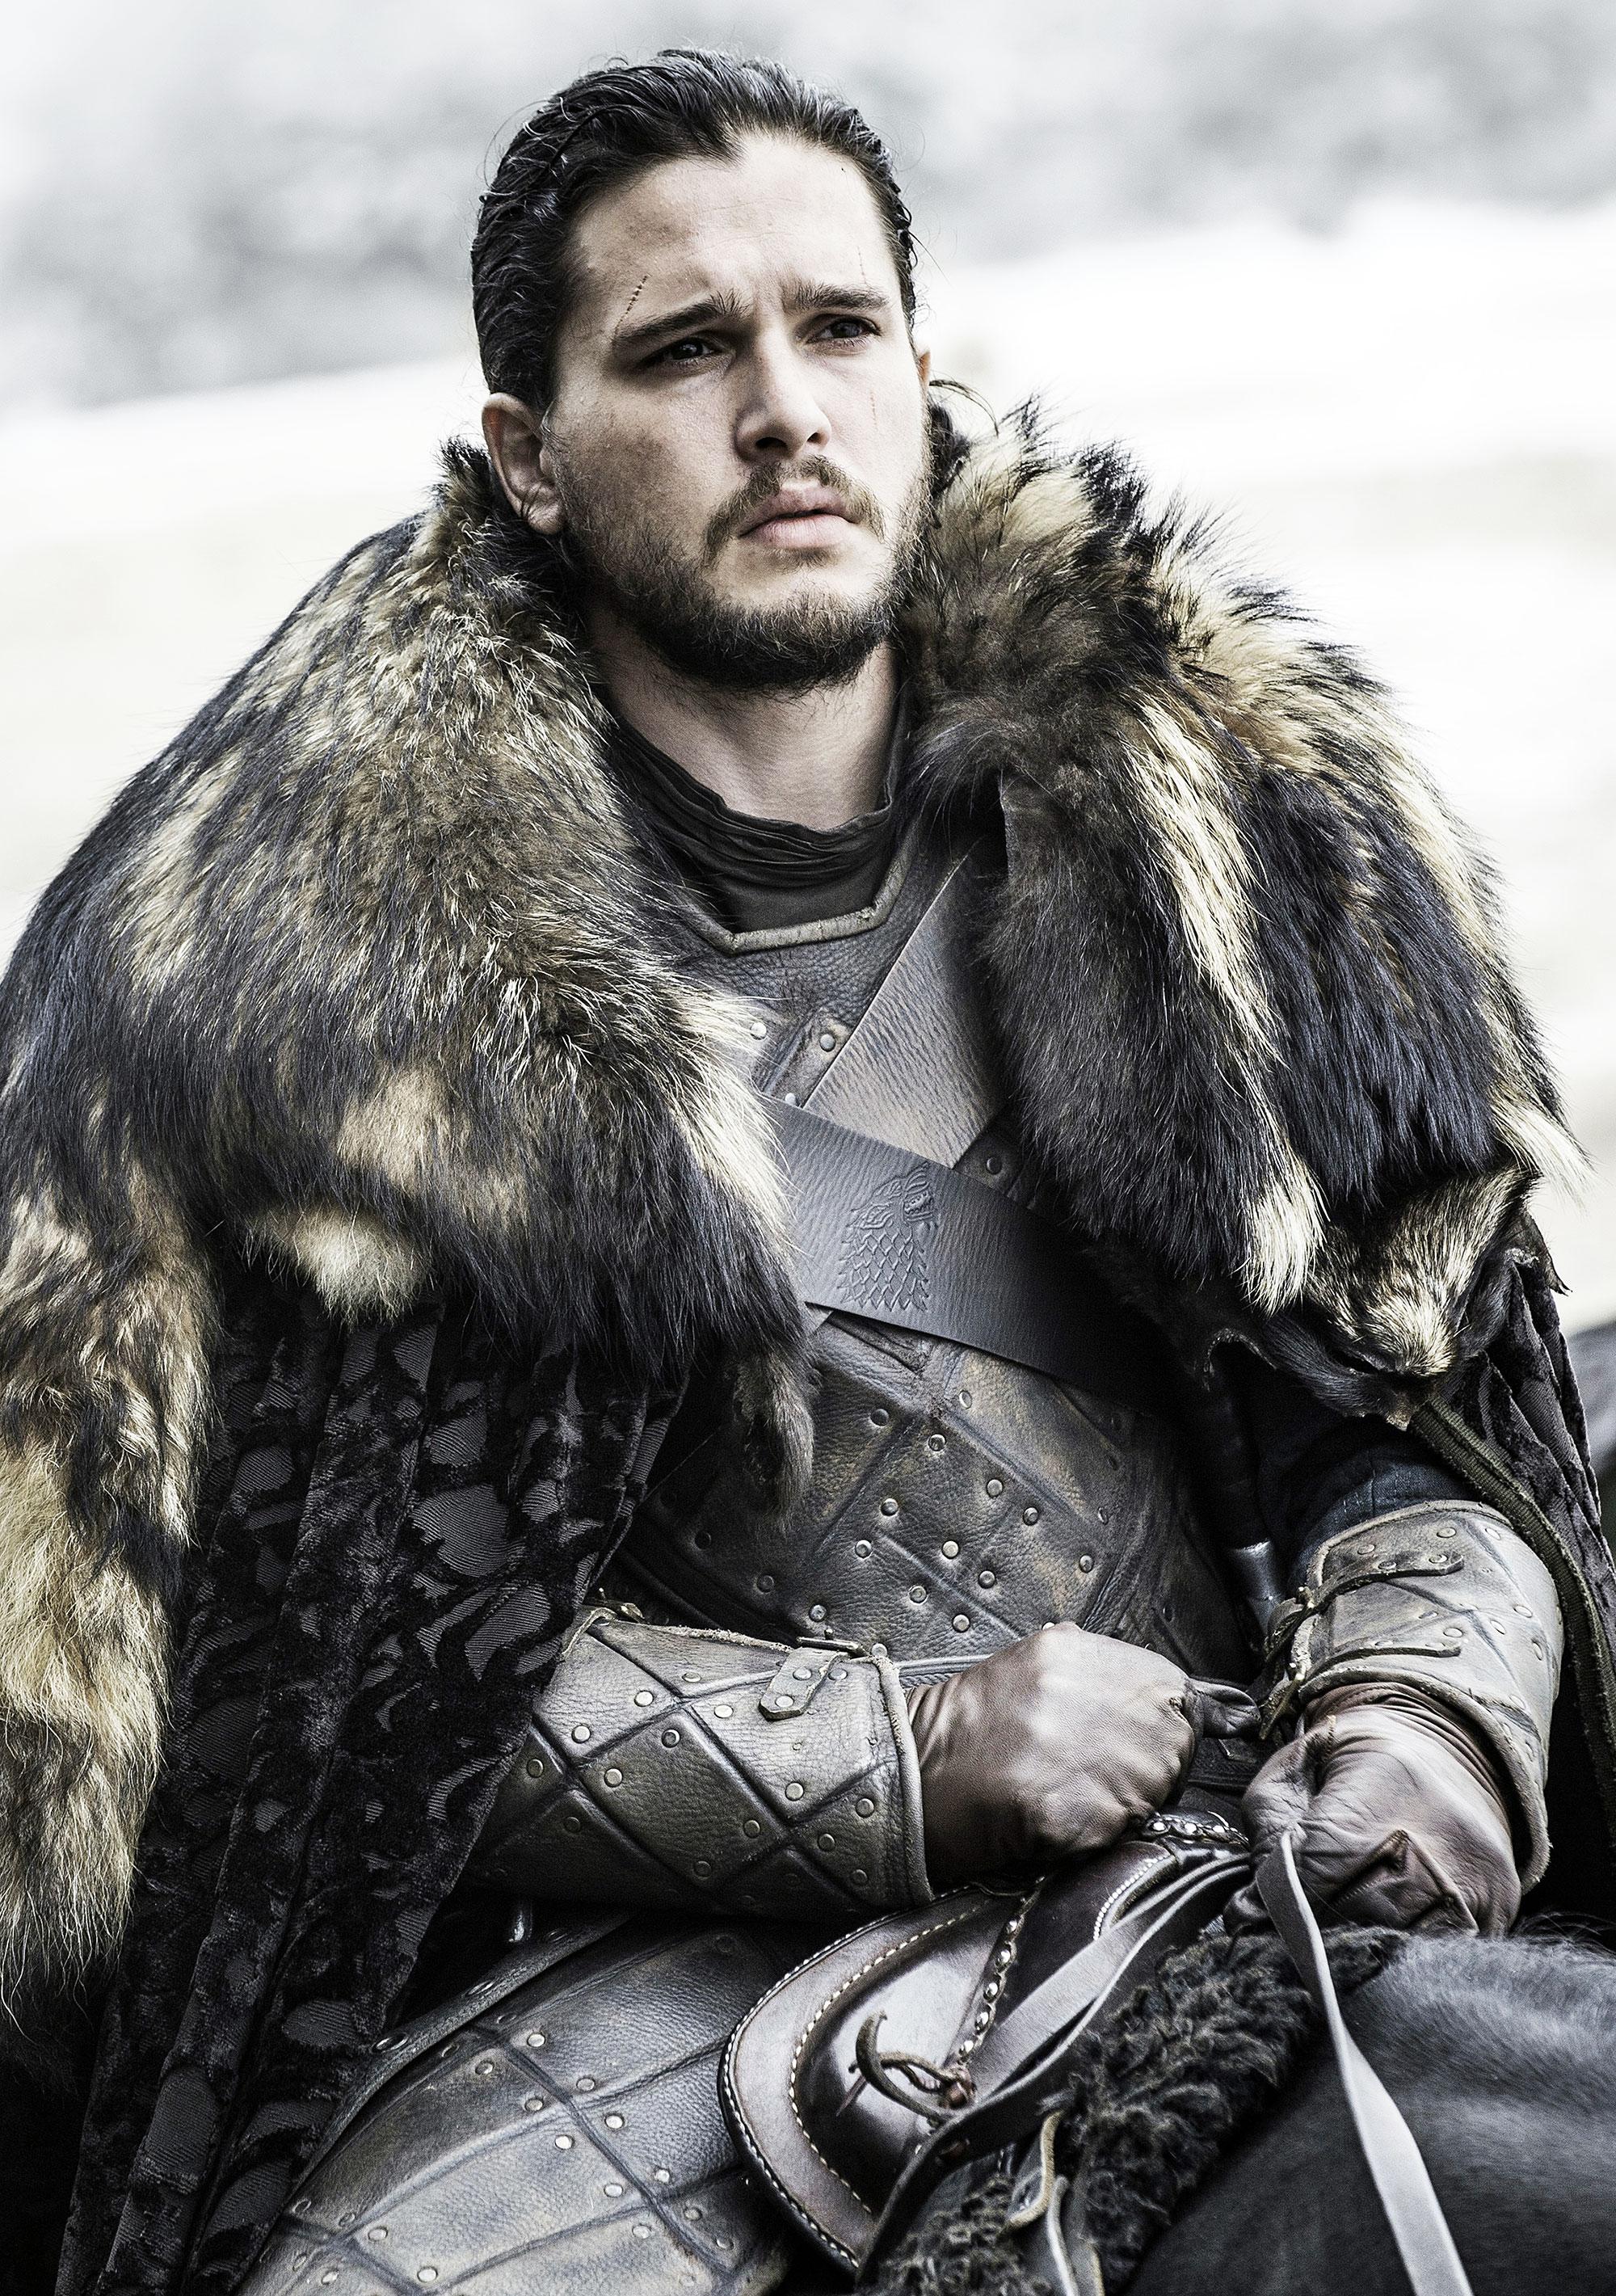 Kit Harington Game of Thrones Last Season Break the Cast